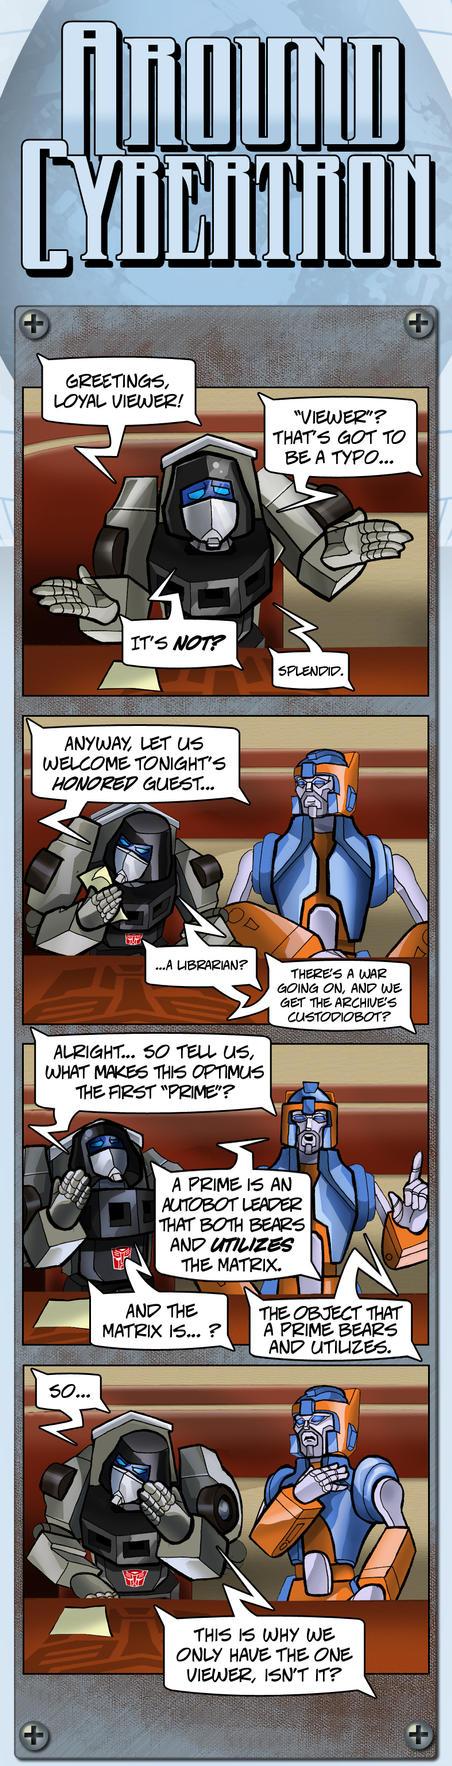 Around Cybertron Part 15 by RID-NightViper